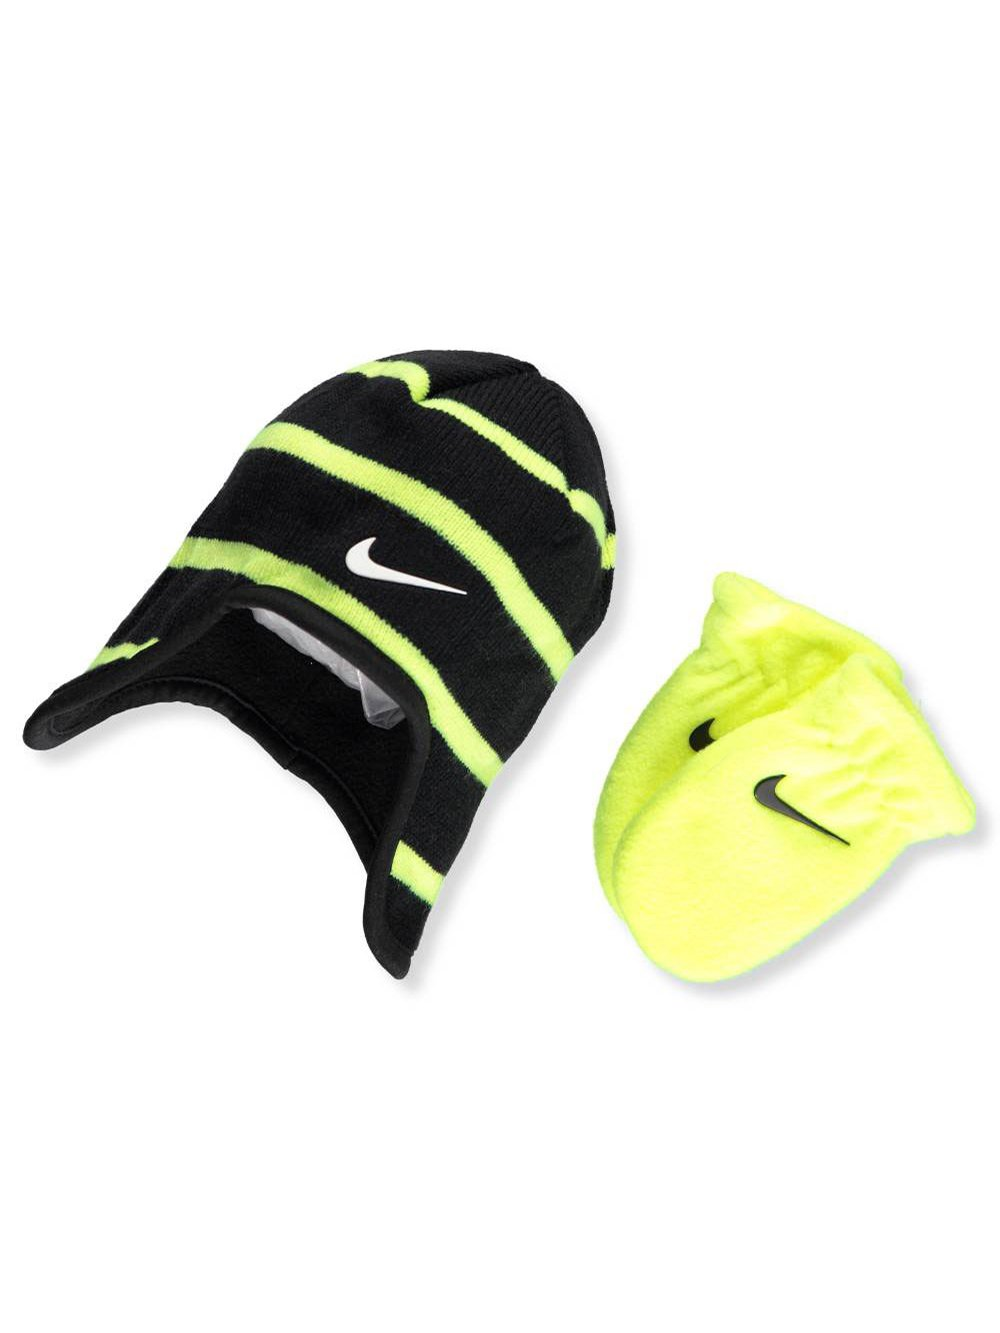 101693da6db Galleon - Nike Baby Boys  2-Piece Beanie   Mittens Set - Black